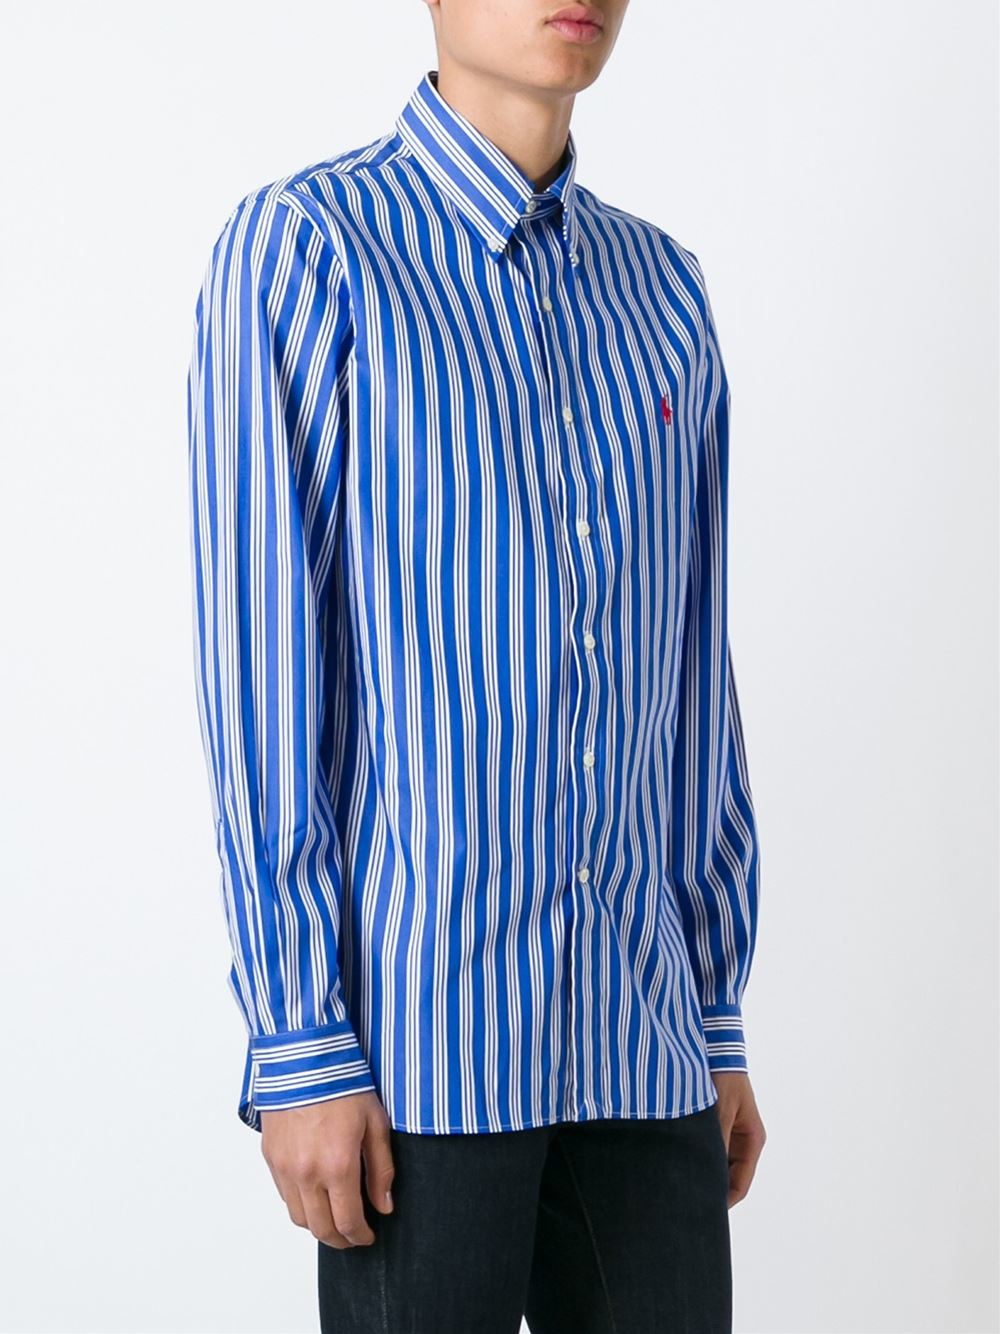 Lyst polo ralph lauren striped button down shirt in blue for Polo ralph lauren casual button down shirts